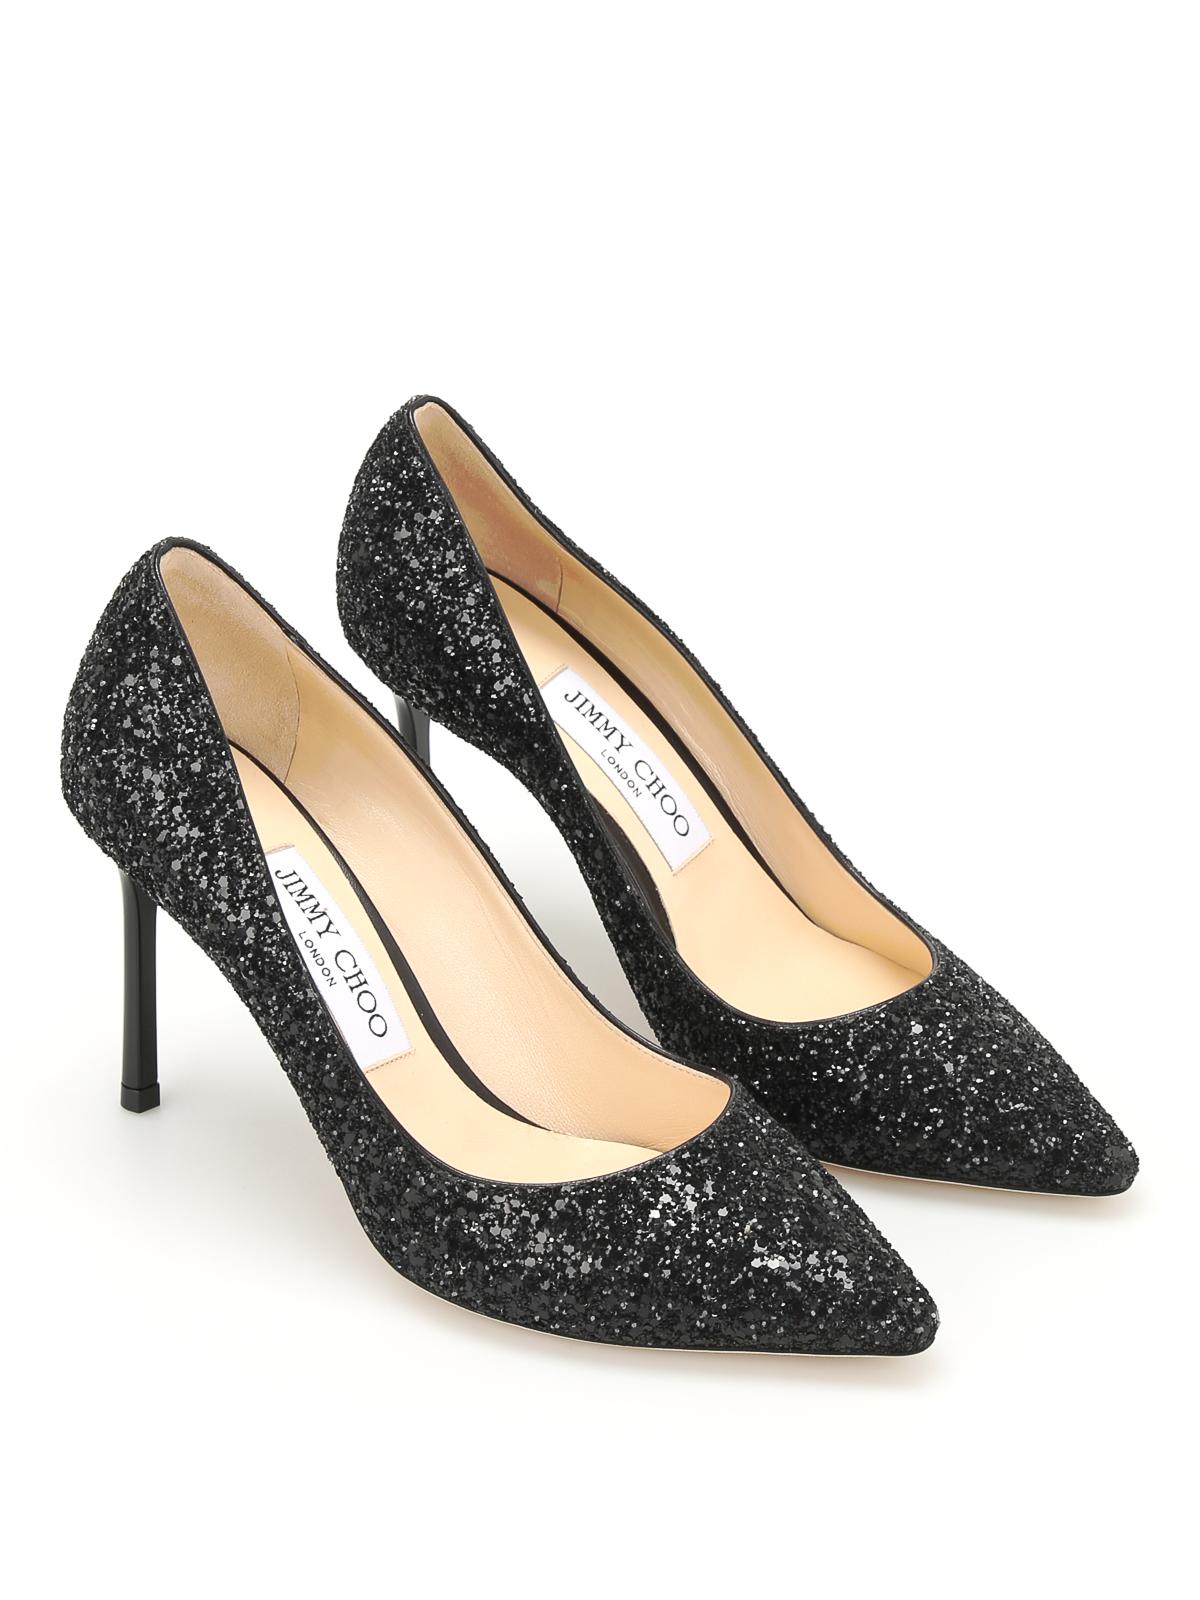 a78c9f7769509 Jimmy Choo - Romy glitter sensual pumps - court shoes - ROMY 85 CGF ...